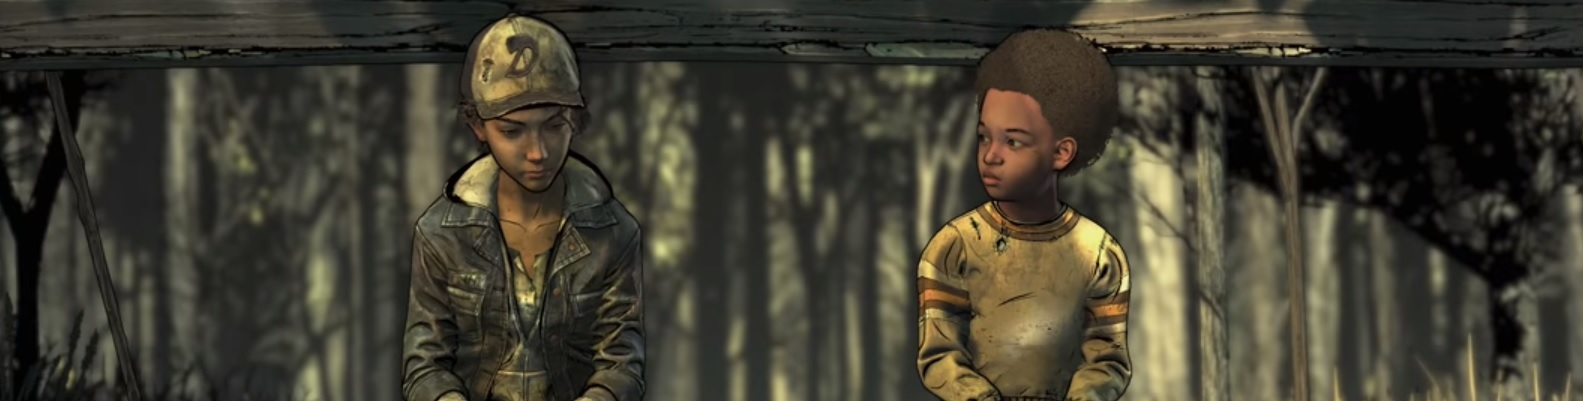 Walking Dead Games News